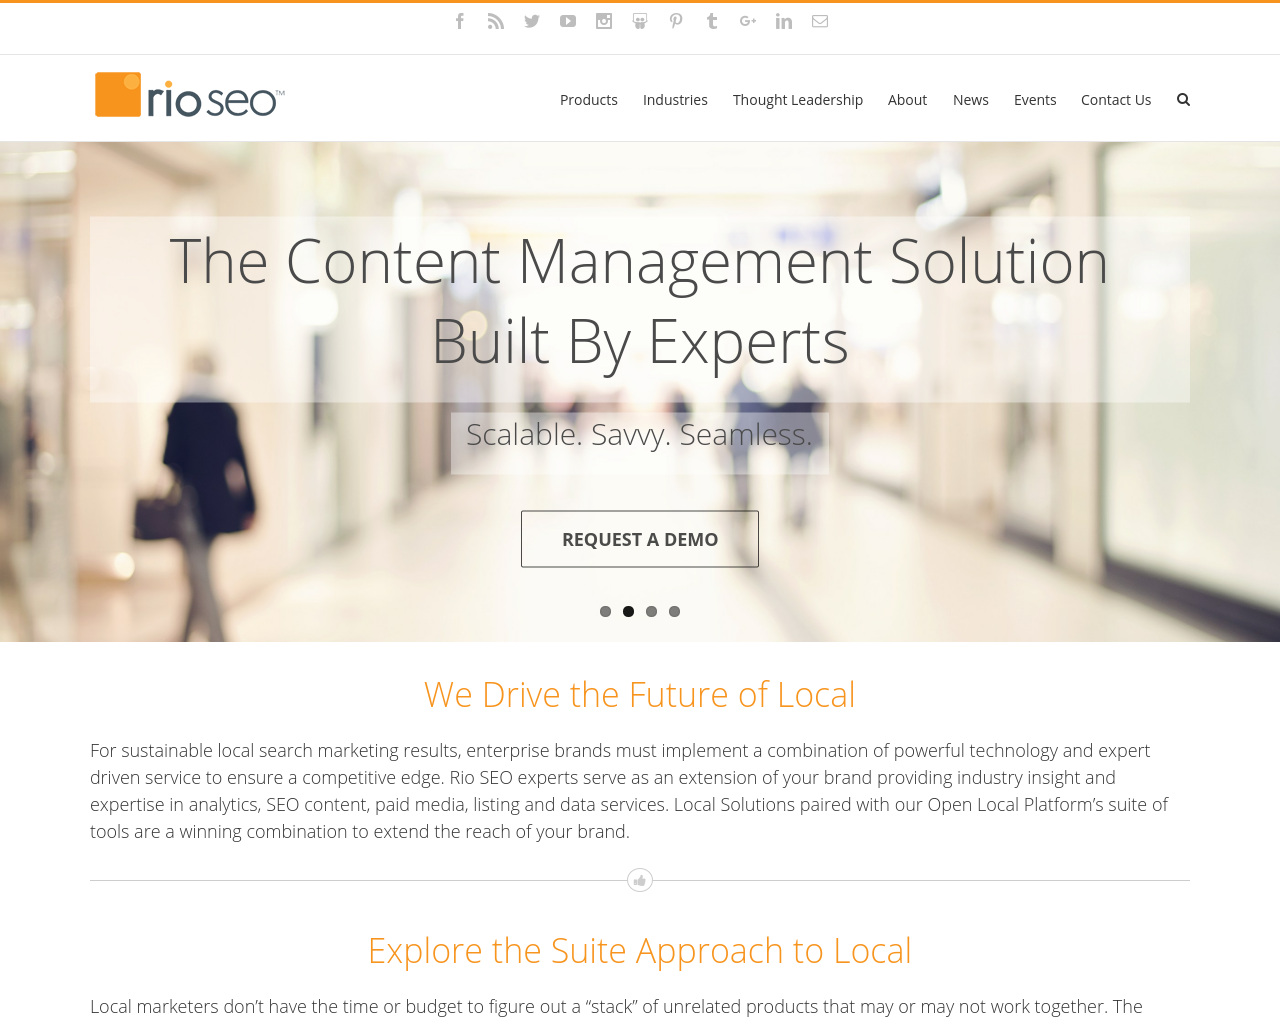 Meteor-Solutions-/-Rio-SEO-Social-Advertising-Reviews-Pricing